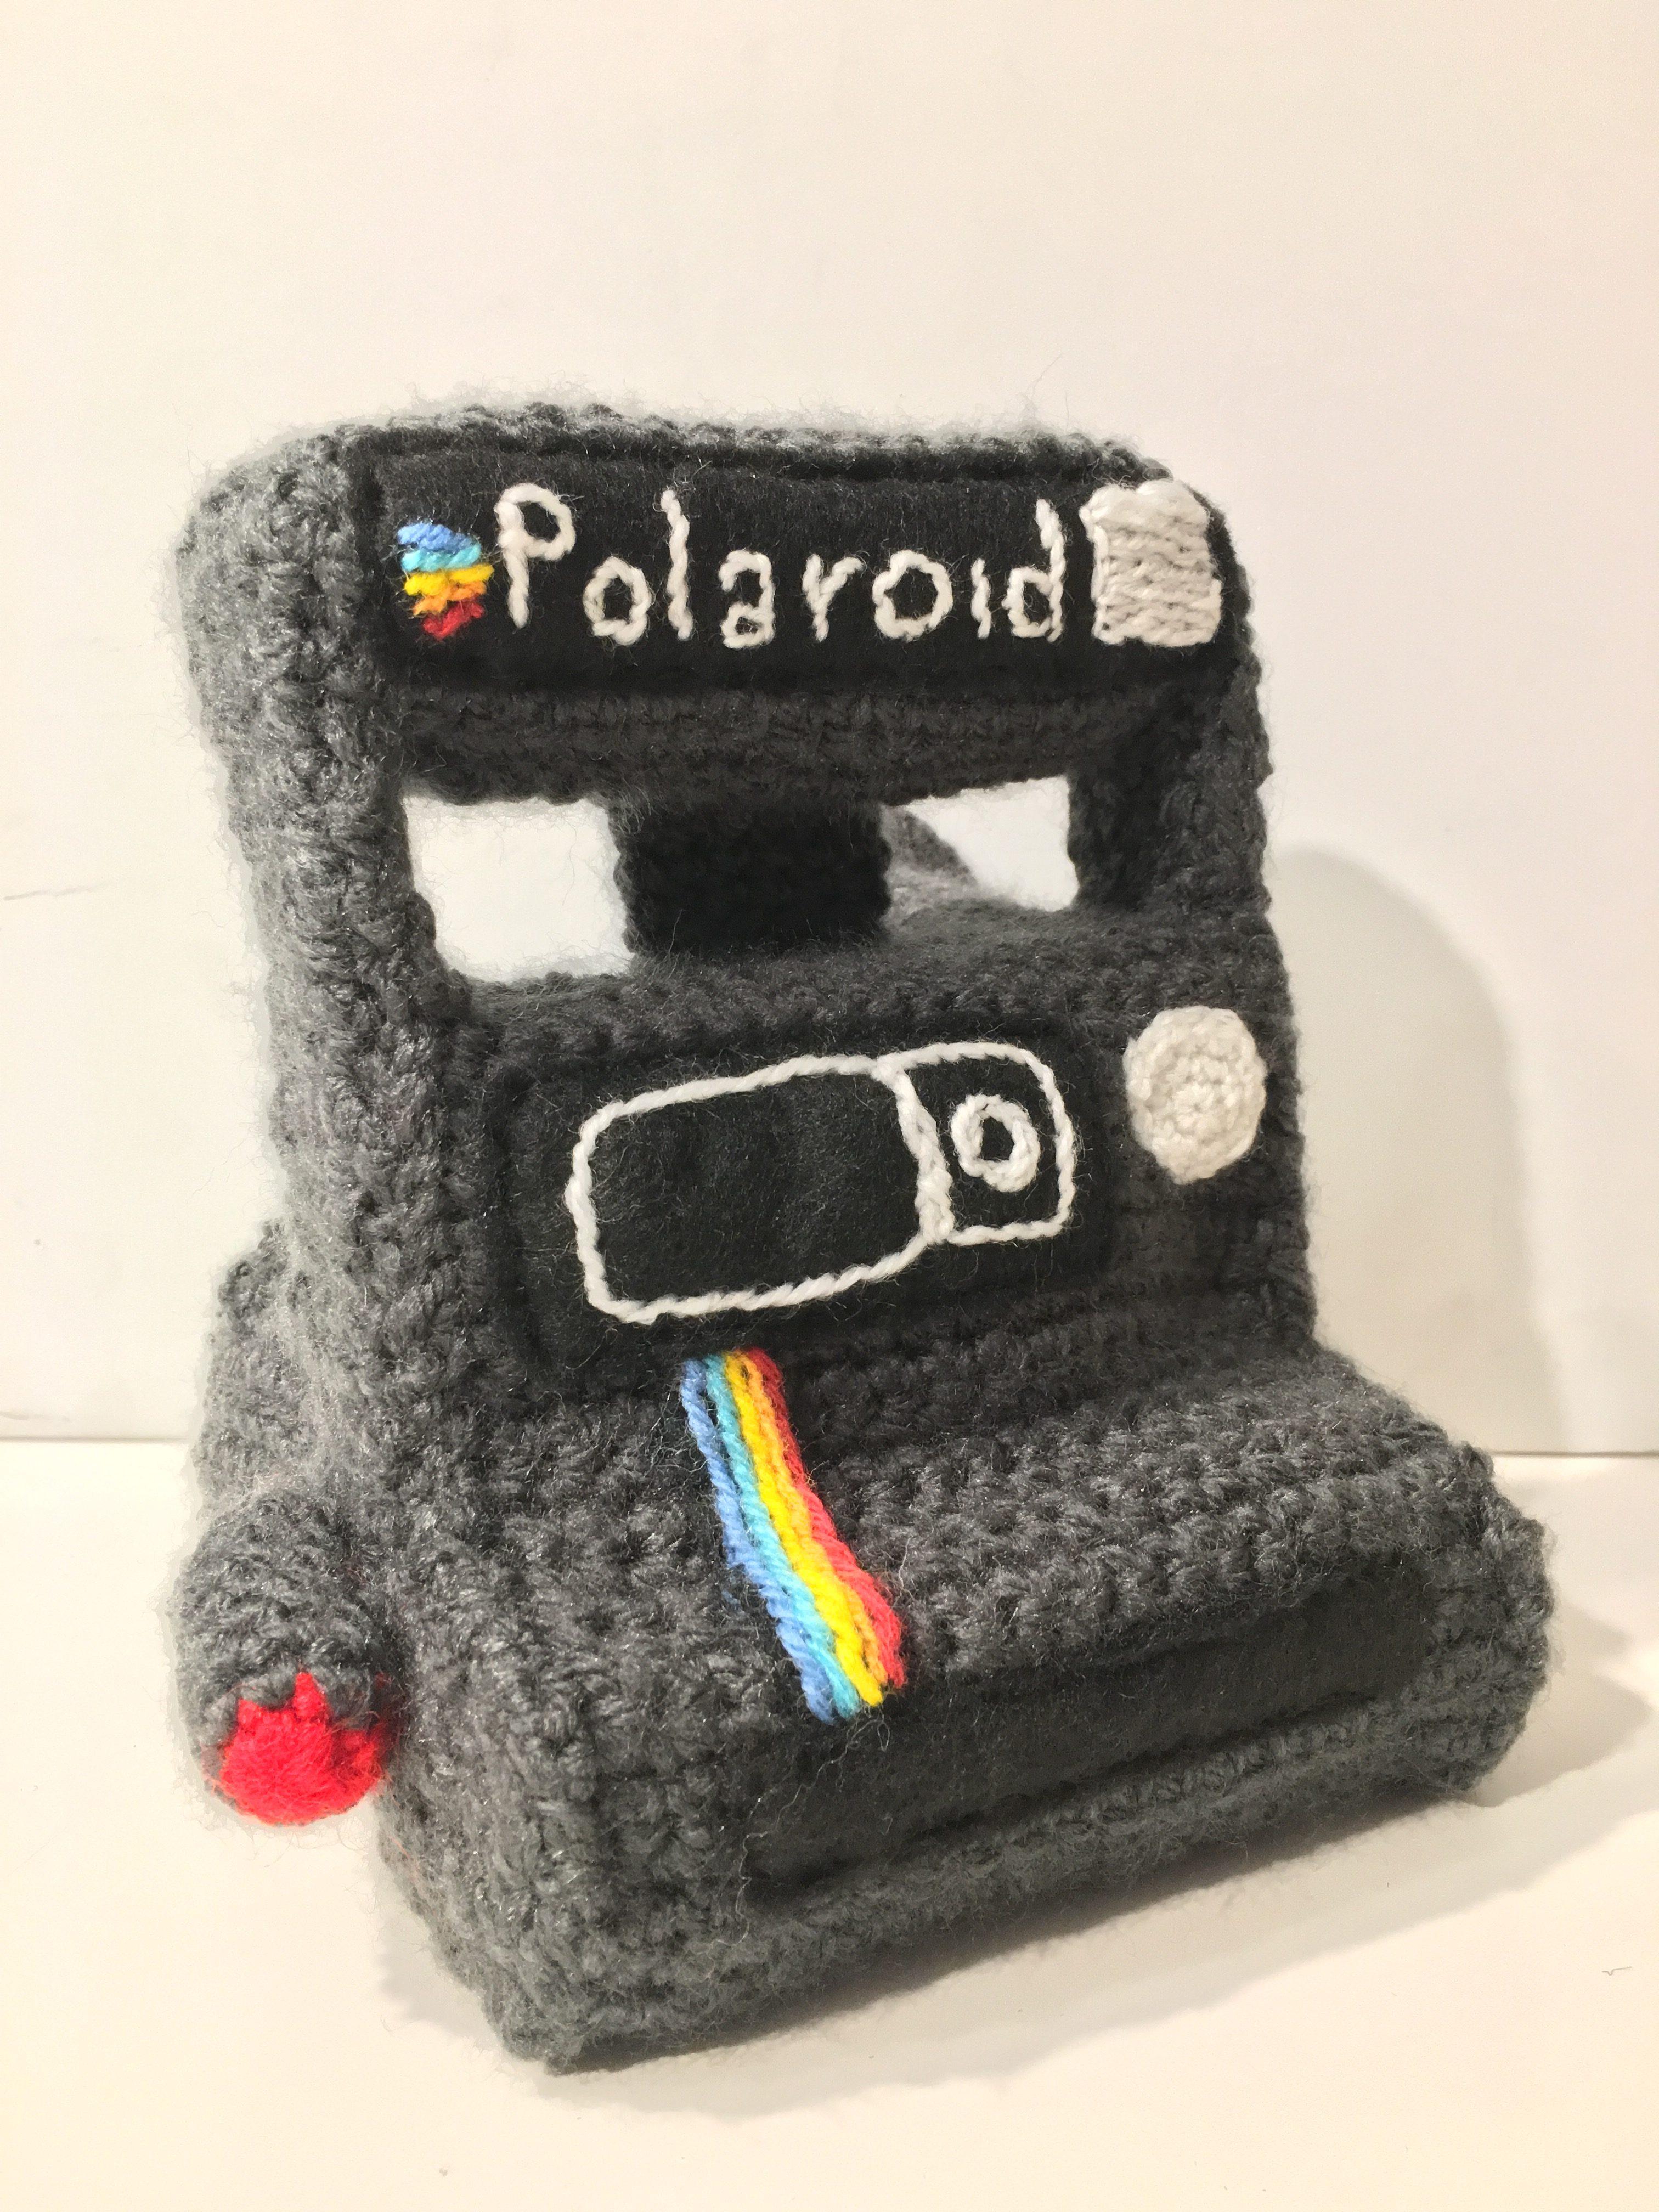 Amigurumi Polaroid e1511886561691